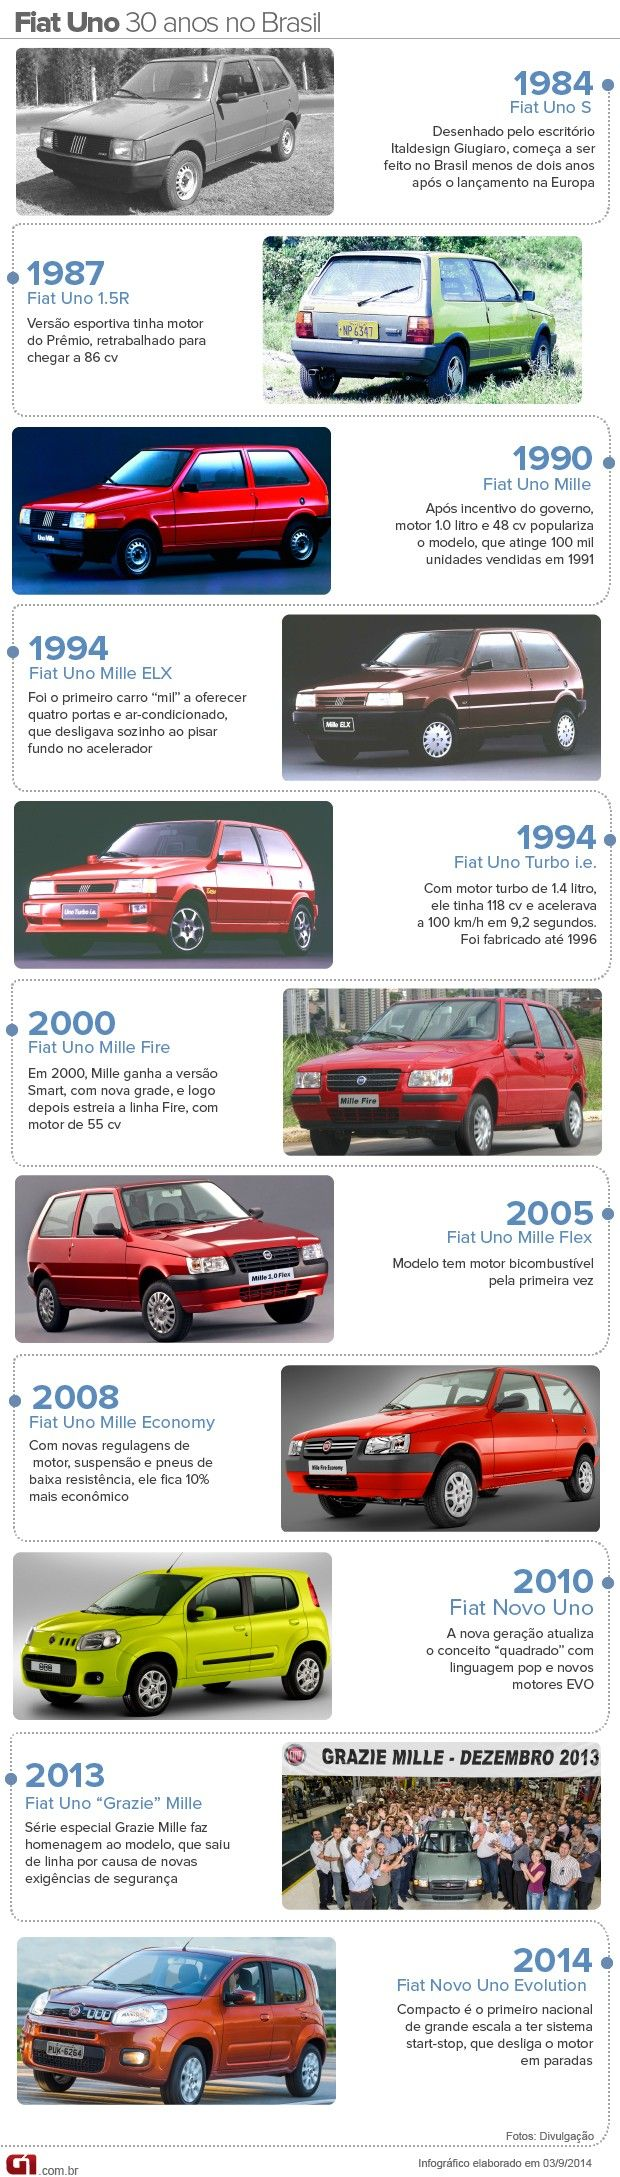 Fiat Uno 2015 reestilizado parte de R$ 30.990; veja todos os preços http://glo.bo/1xf69LX